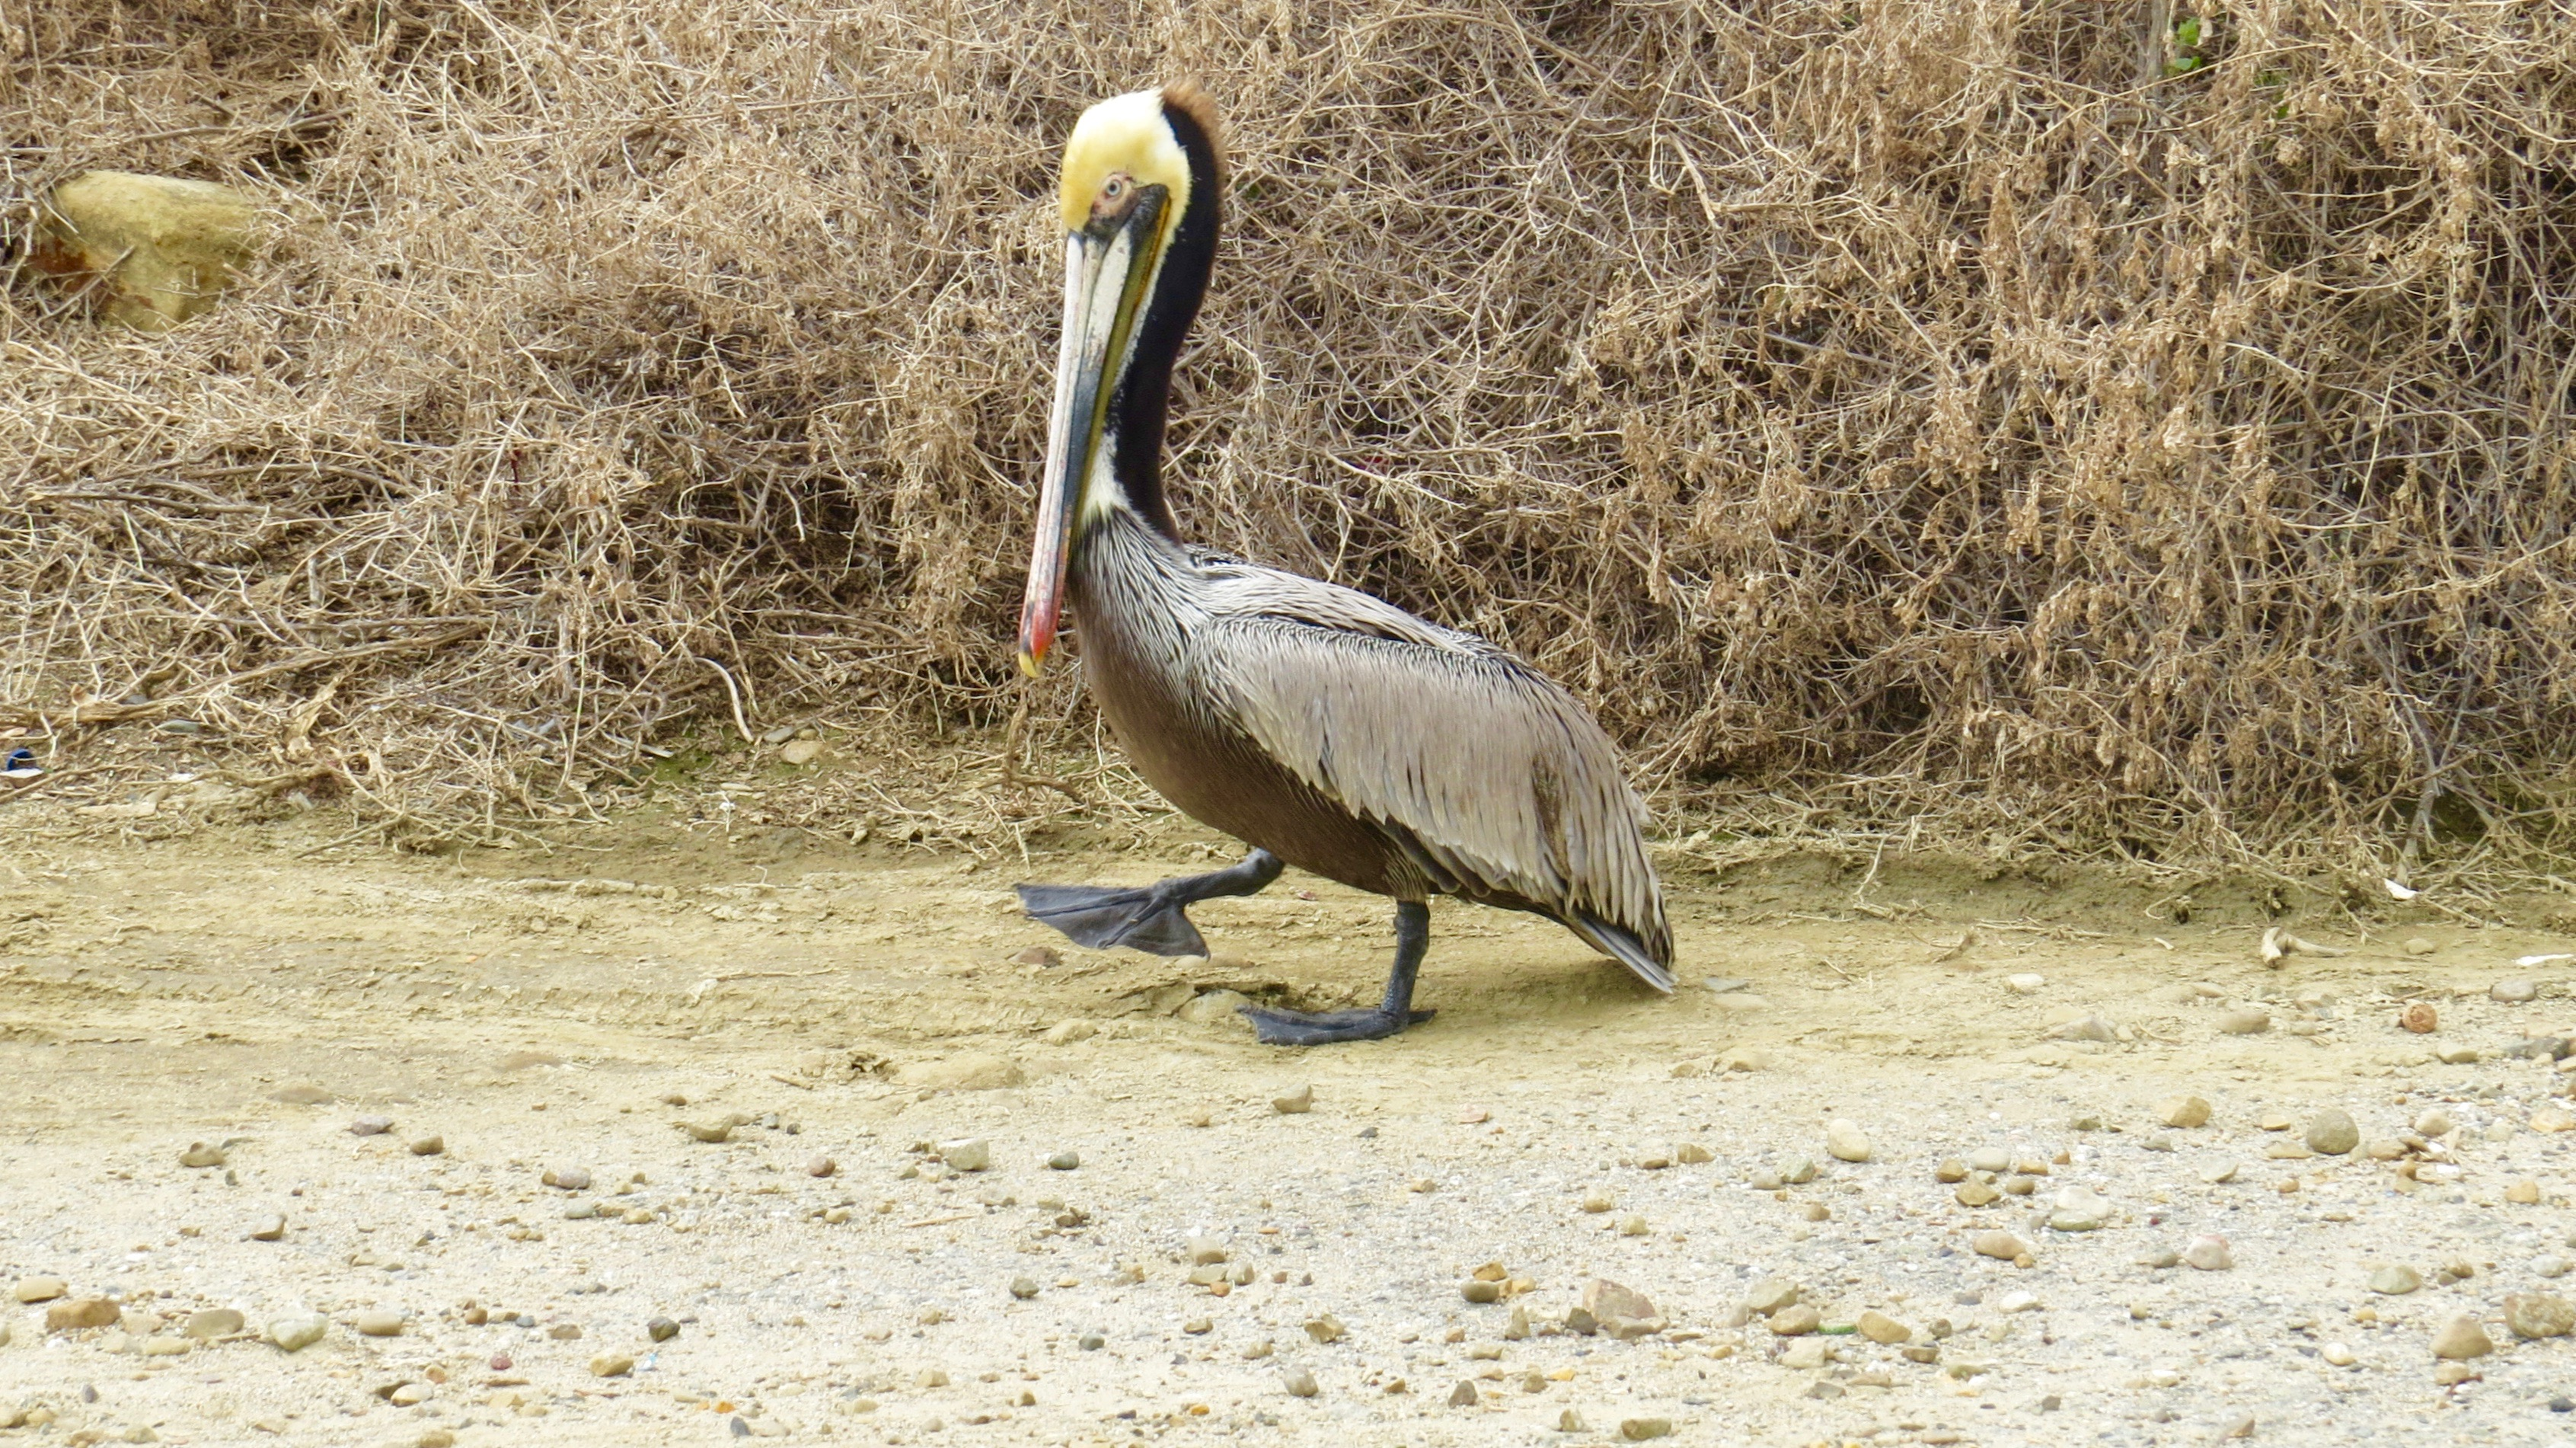 Strolling near the Pacific Coast Highway, Carpinteria. Brown Pelican, 2016.